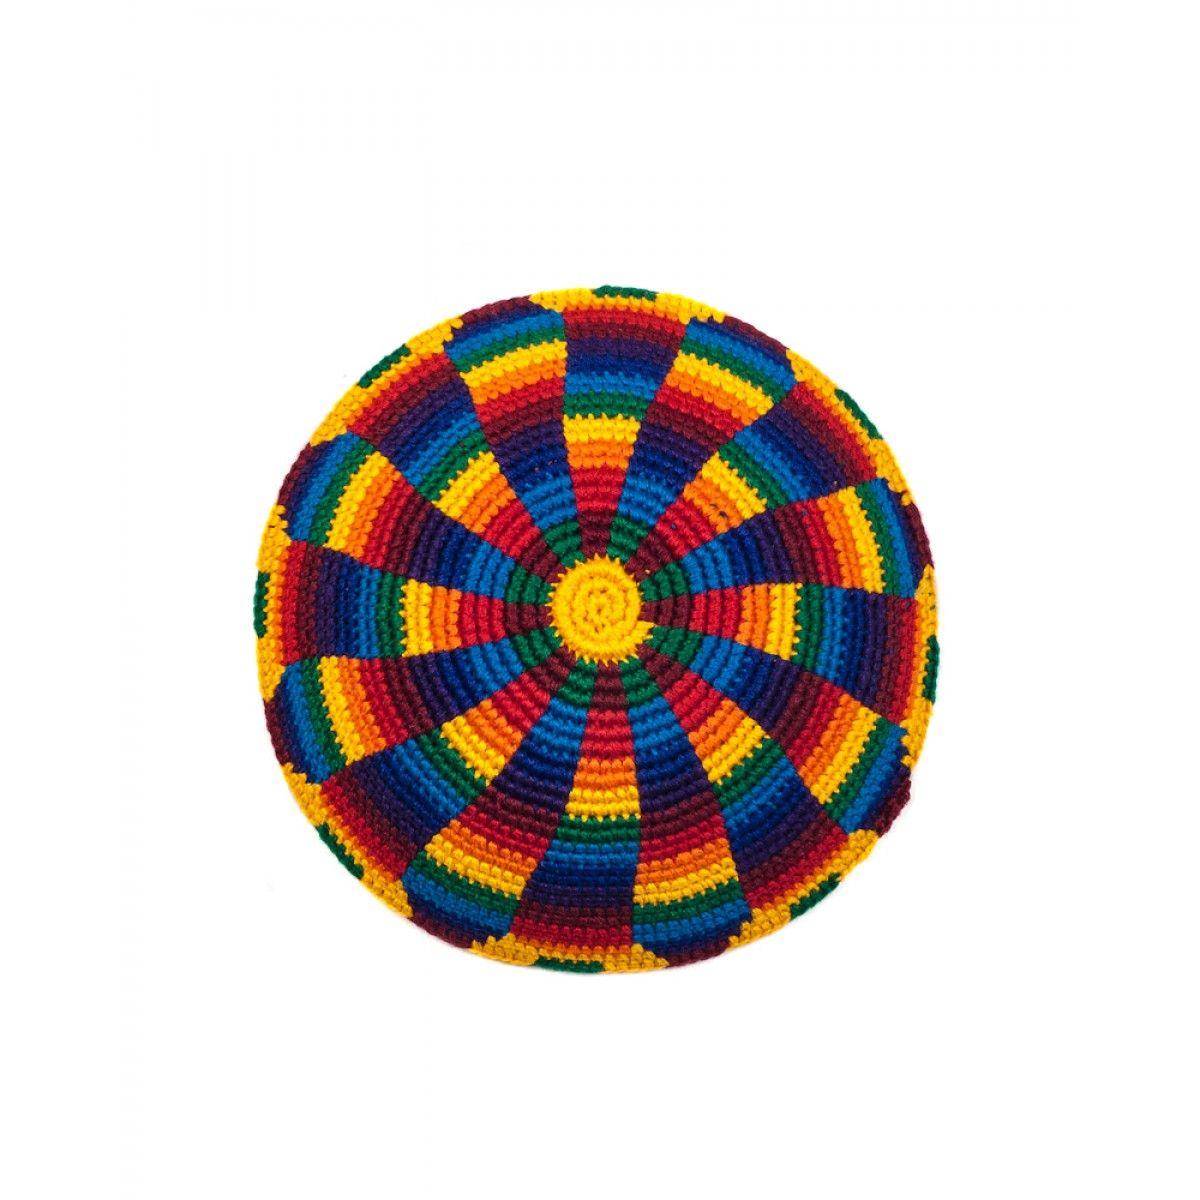 Guatemalan Psychedelic Rainbow Kippot-Yarmulkes   Häkeln